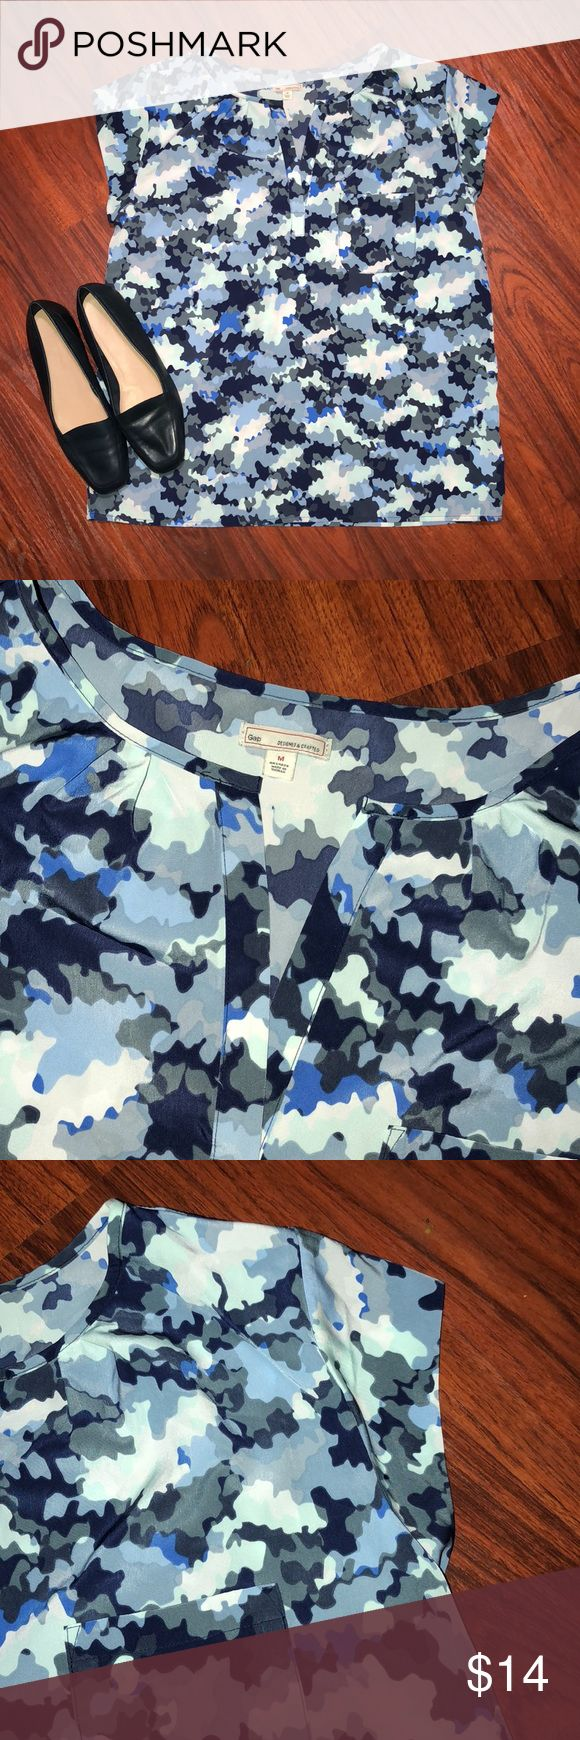 Gap Top Size medium. Super cute and fun blue camo print. Great for jeans or even slacks. GAP Tops Blouses